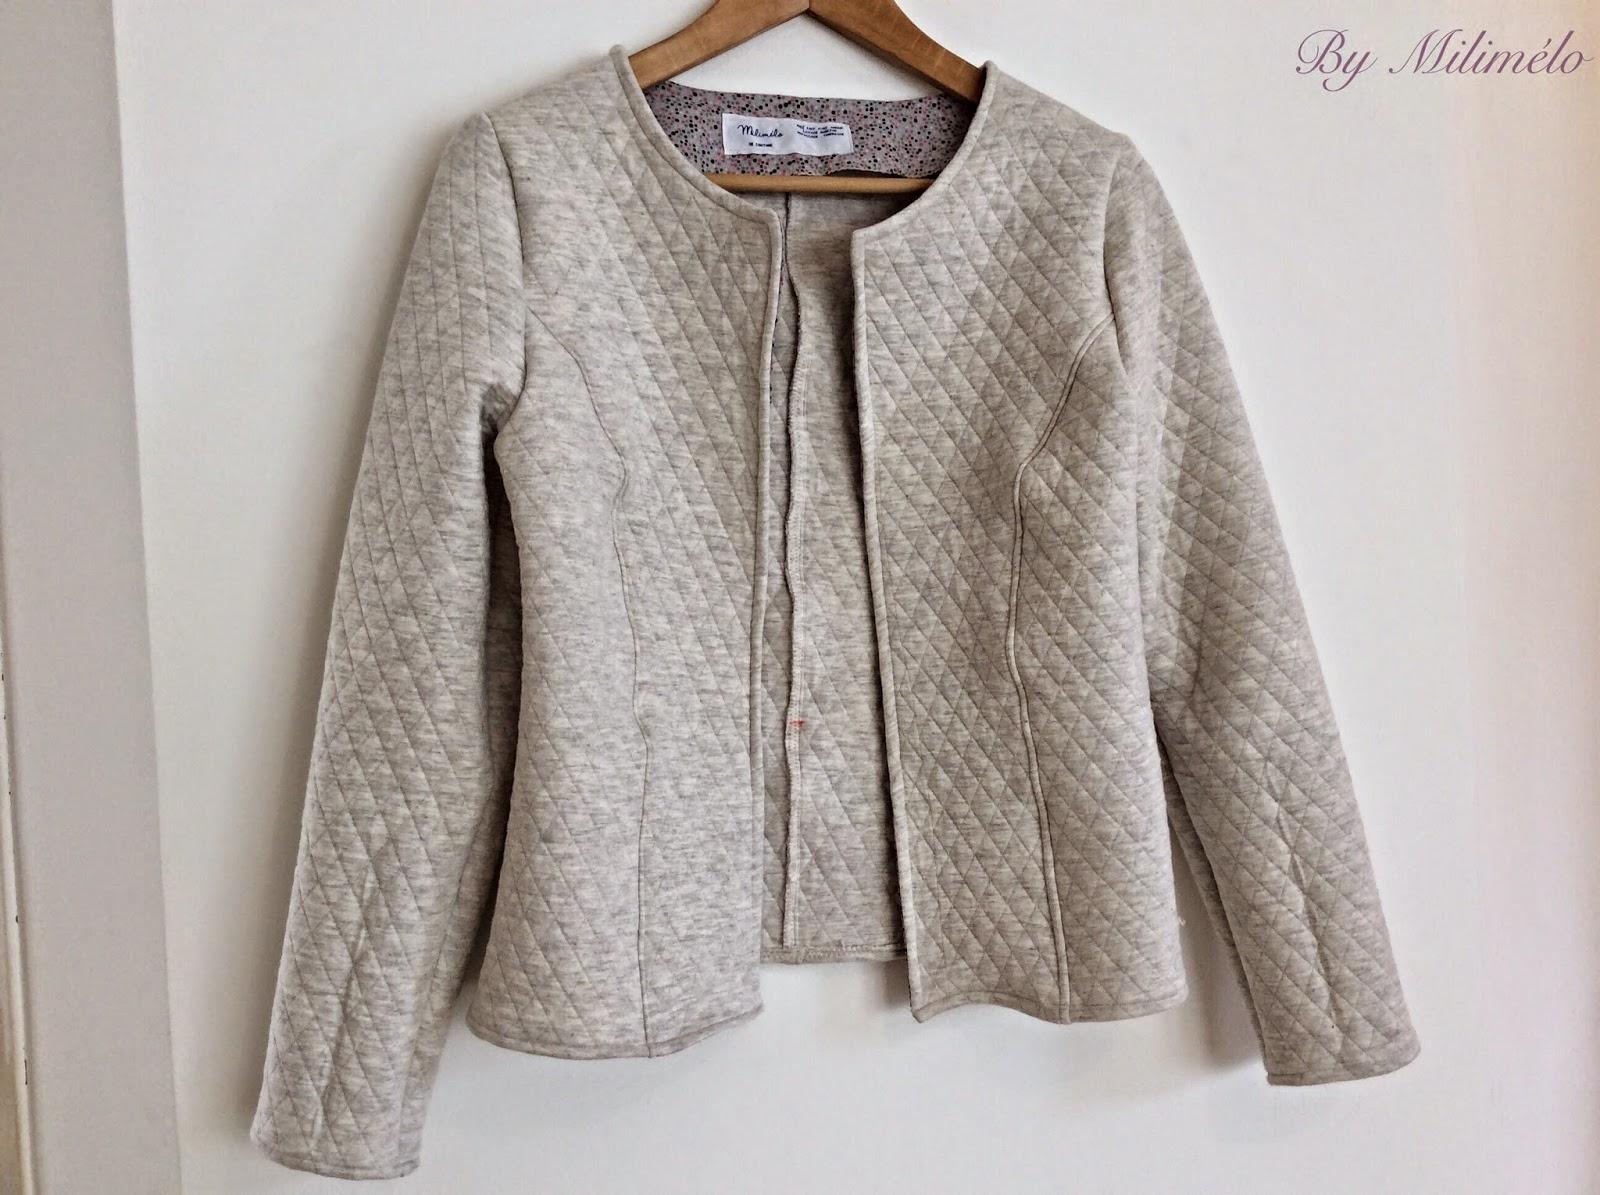 Connu Milimélo de couture: La veste Mona AV28